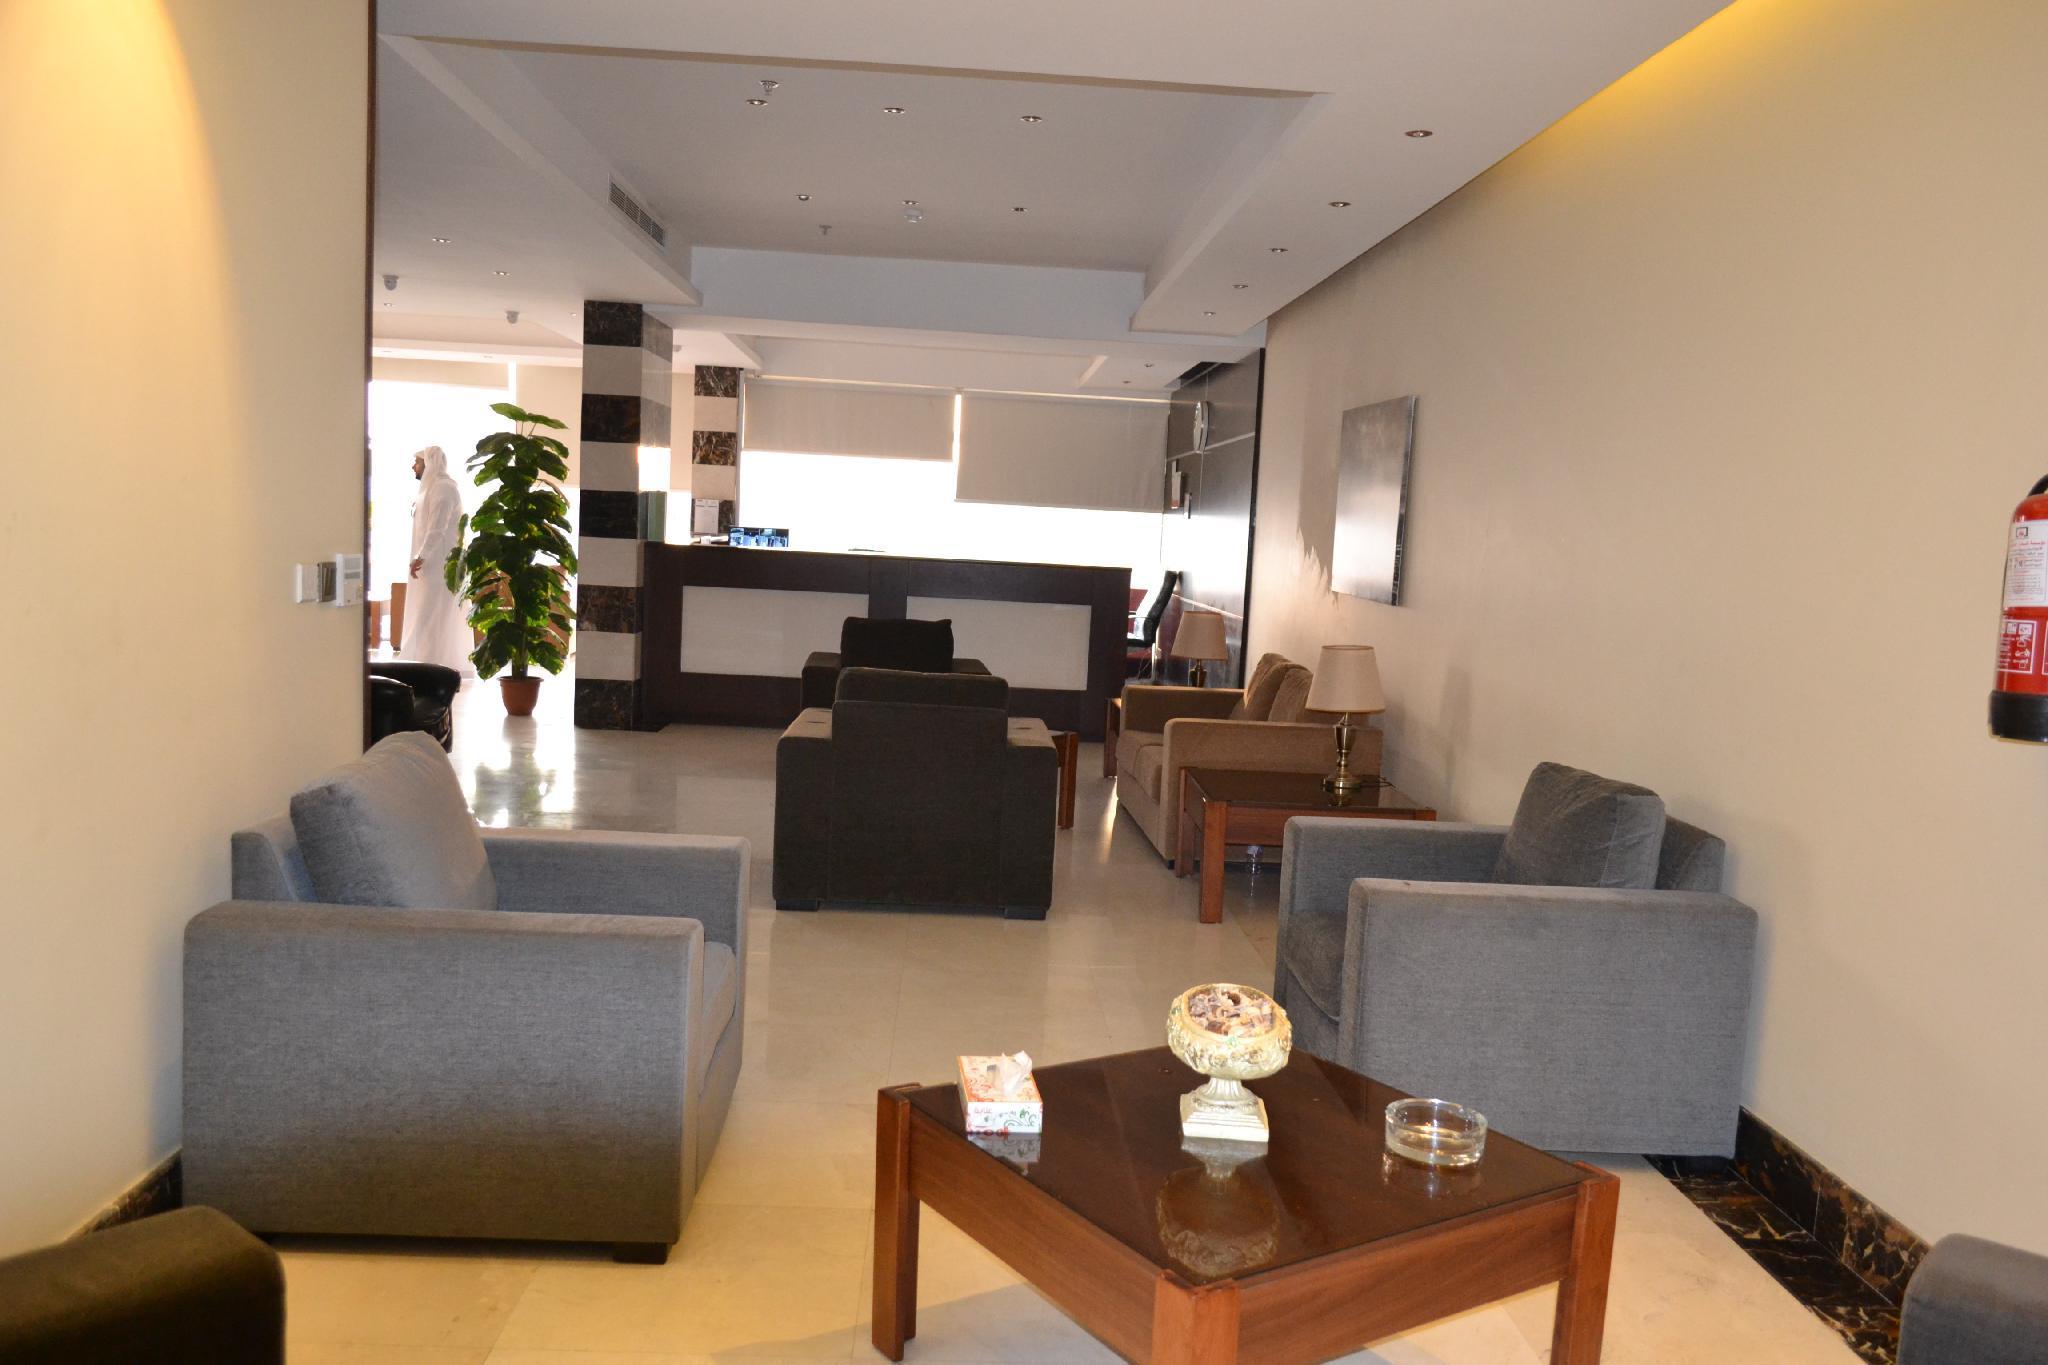 Manazel Al Reehan Homes, Jeddah